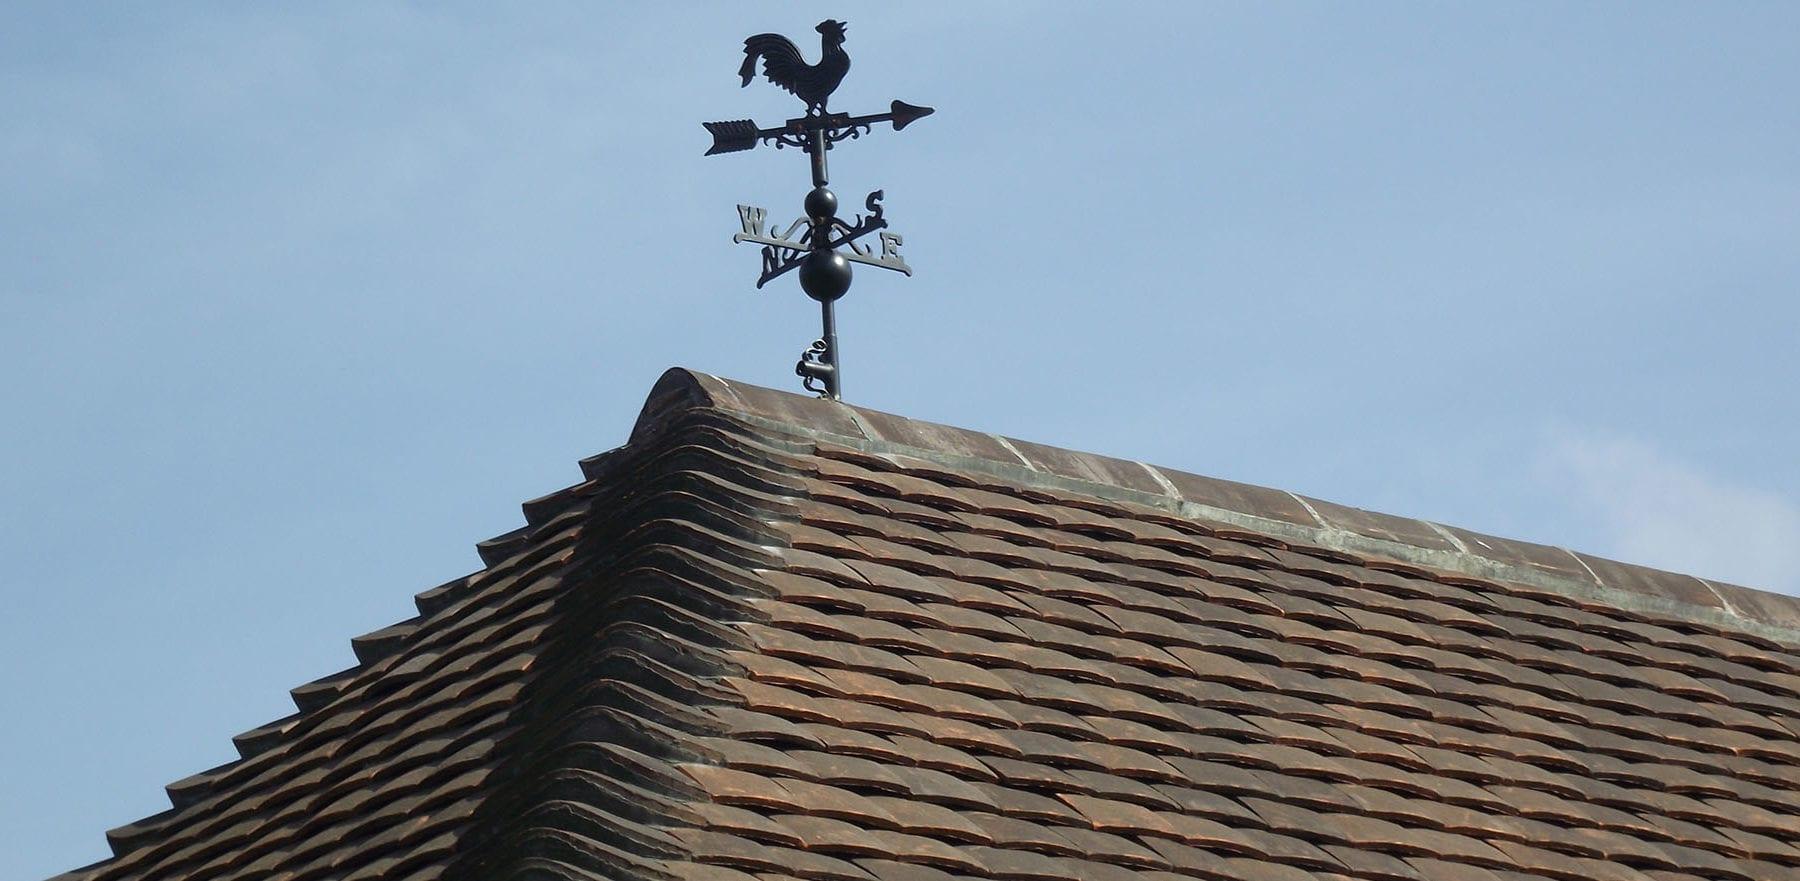 Lifestiles - Handmade Restoration Clay Roof Tiles - Liphook, England 4